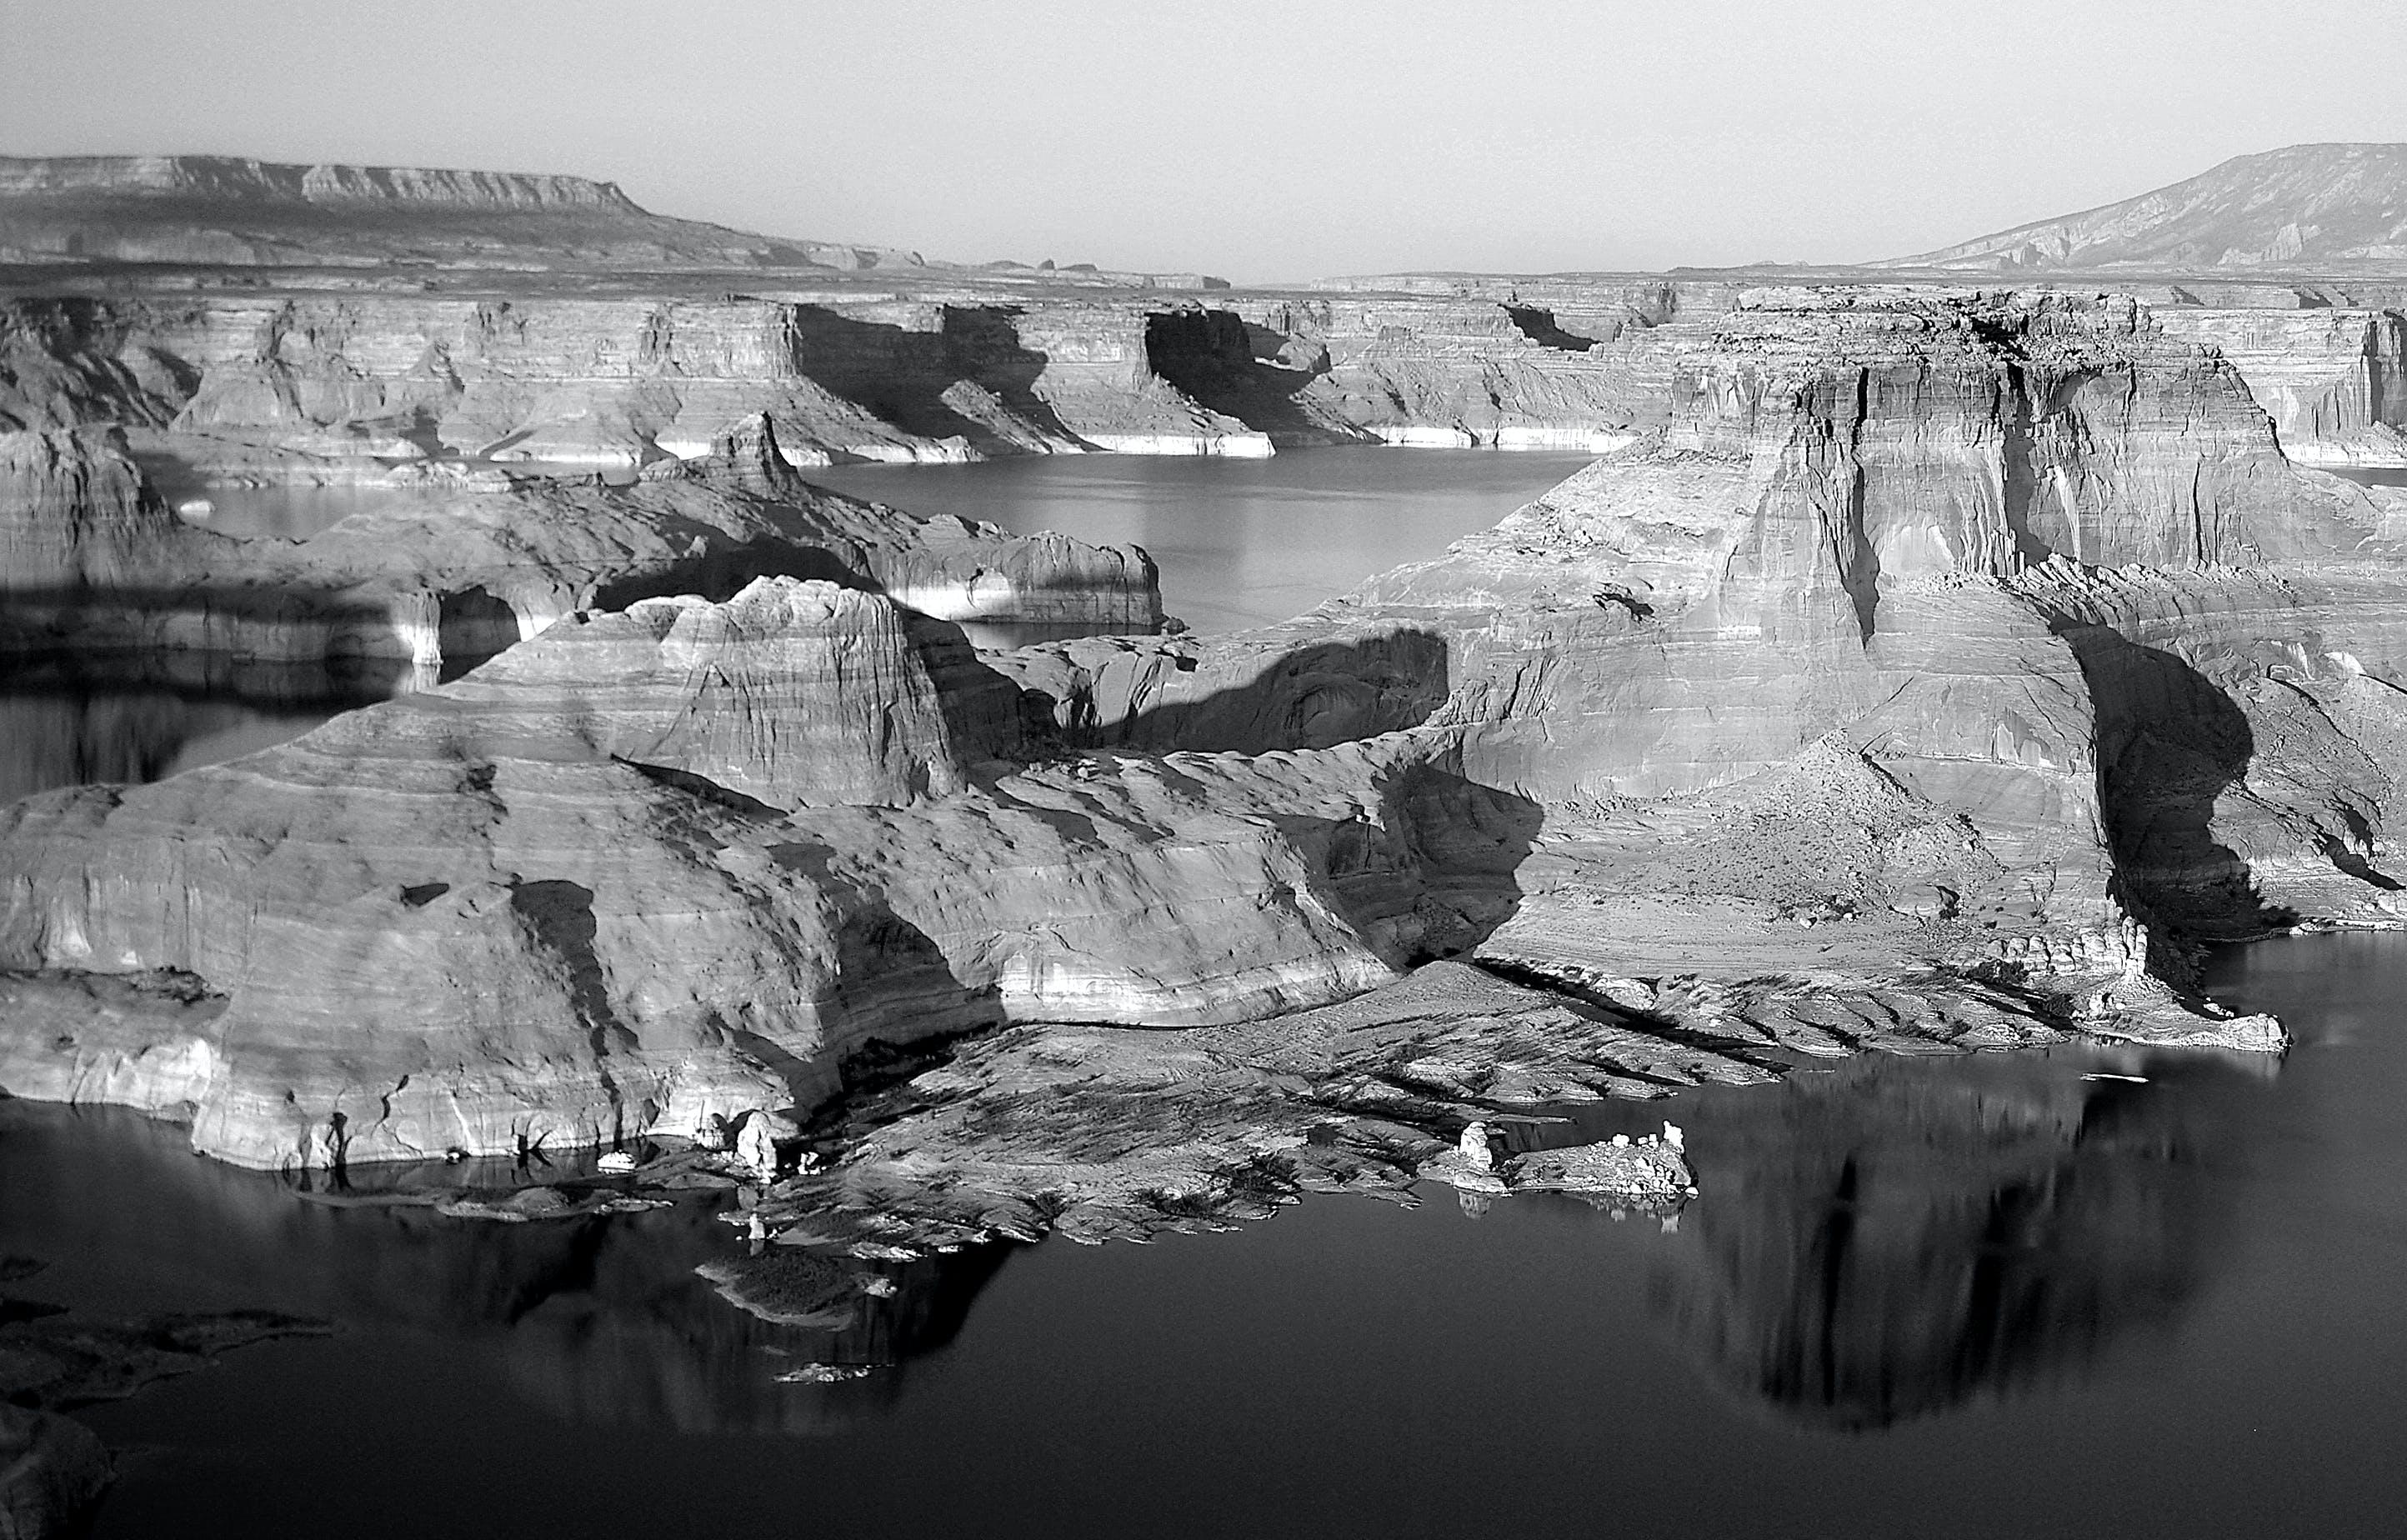 Gray Scale Photo of Mountain Beside Body of Water in Bird's Eye View